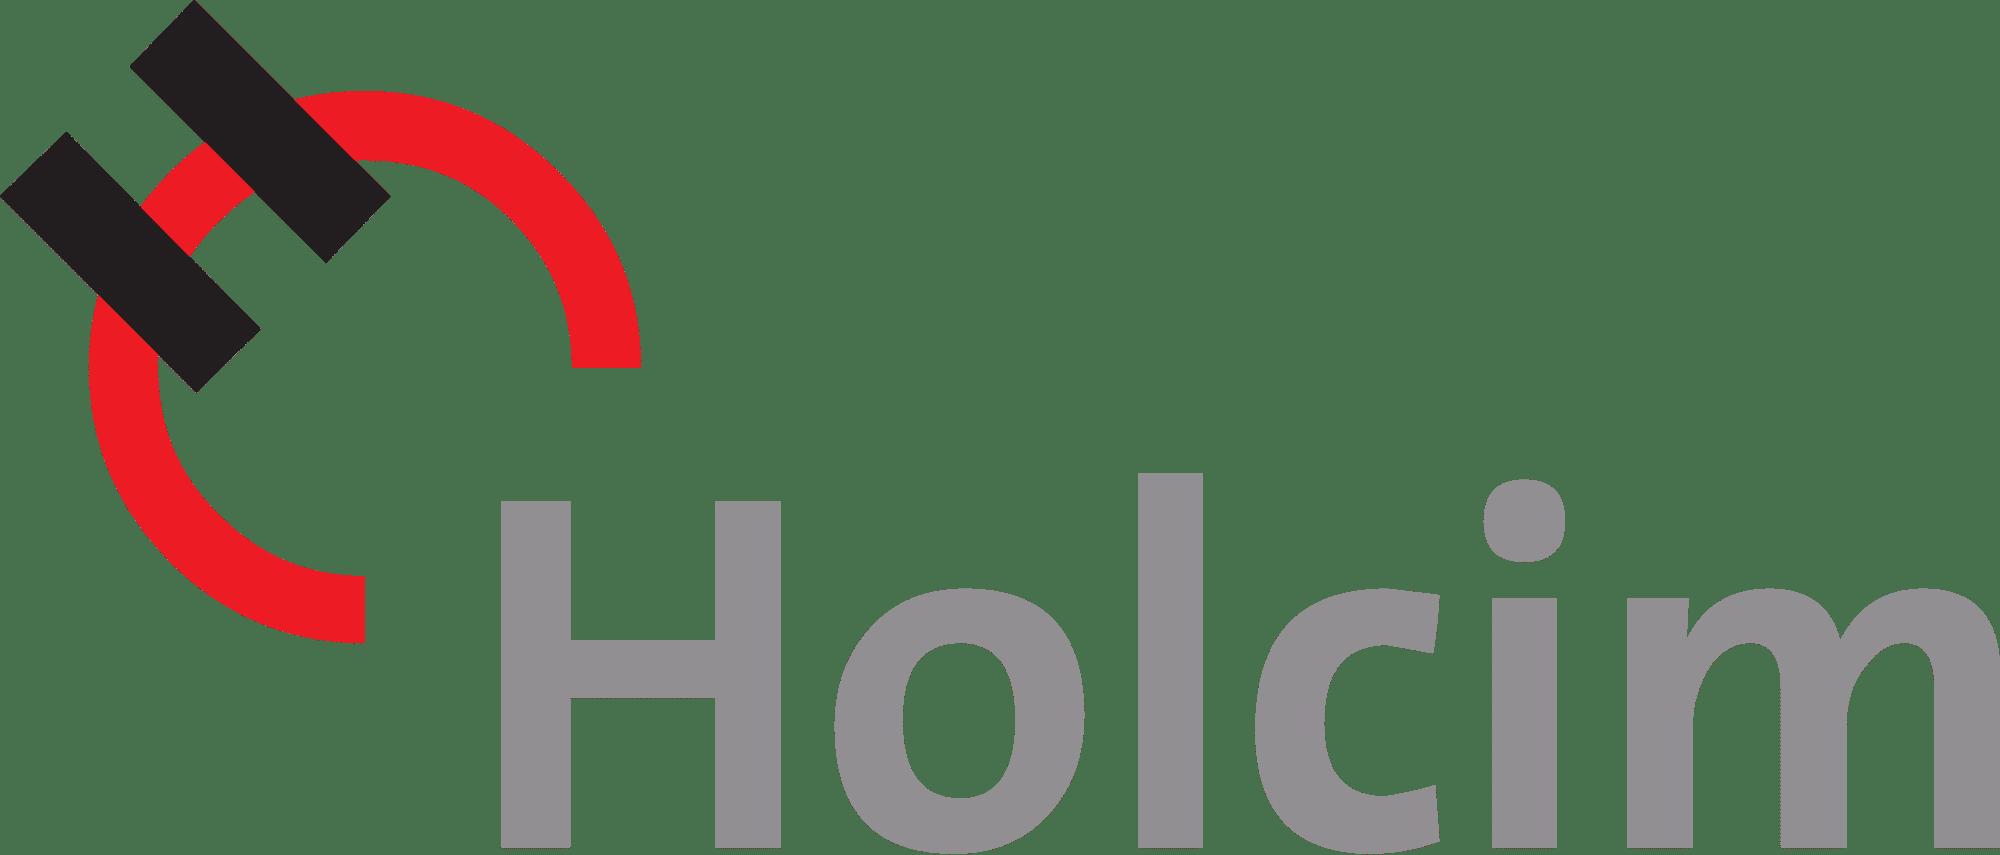 Holcims logo, black, red, grey